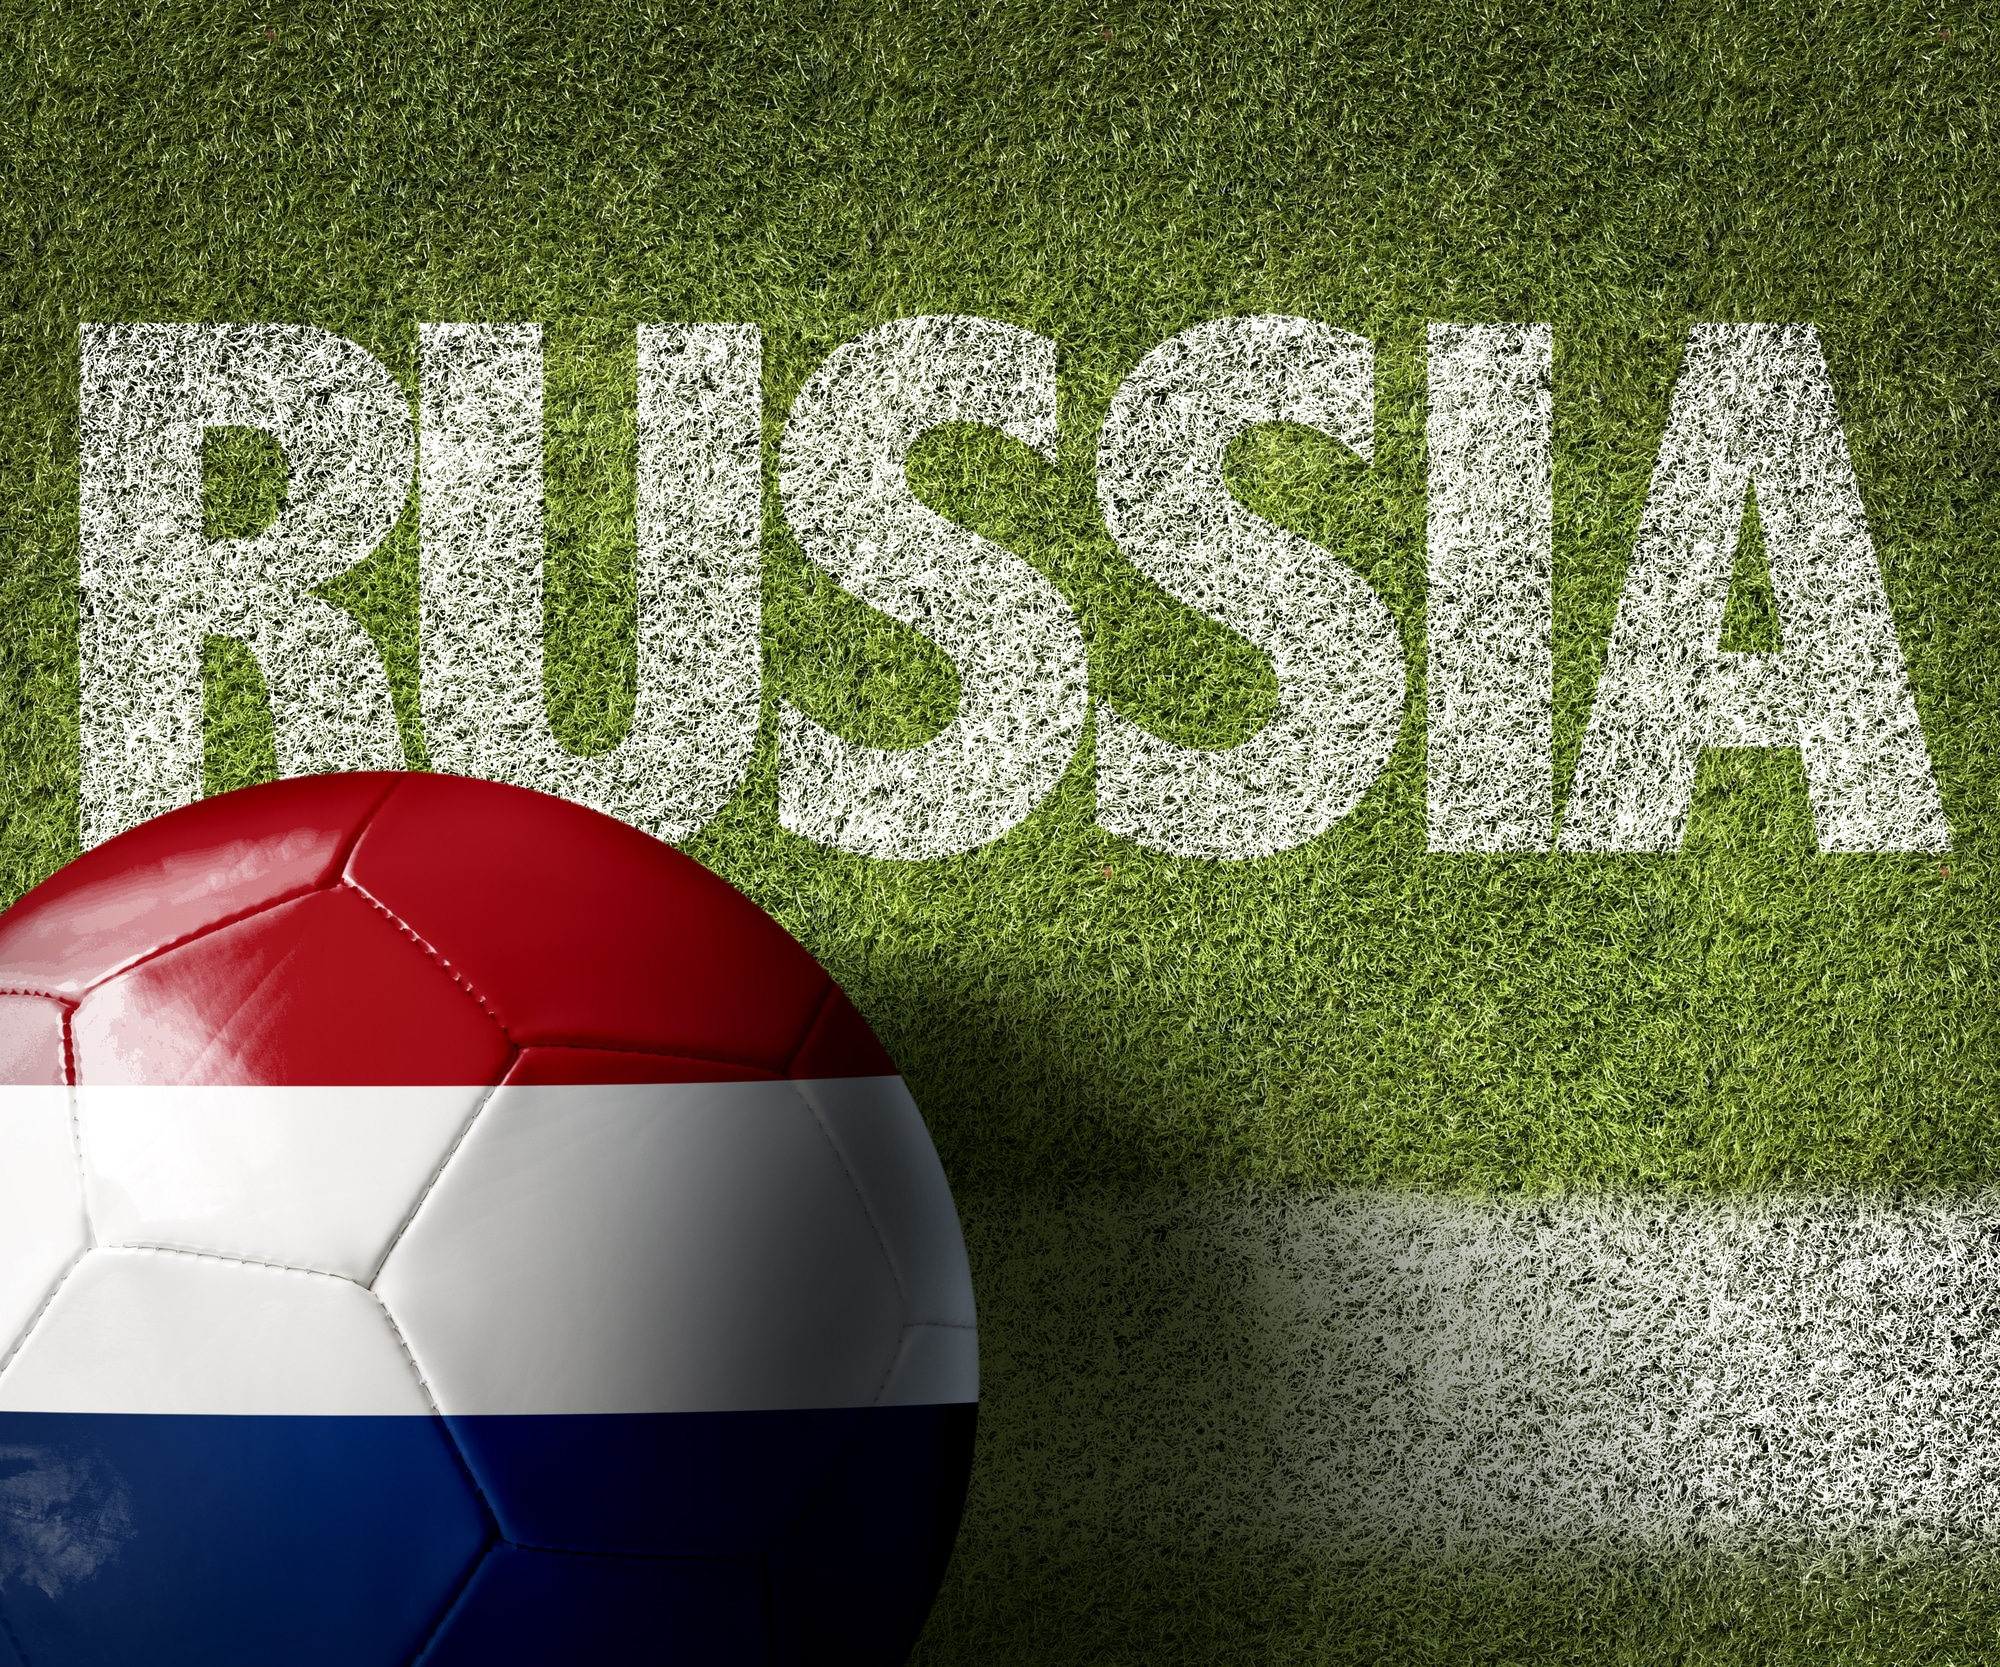 Spain 1, Russia 1